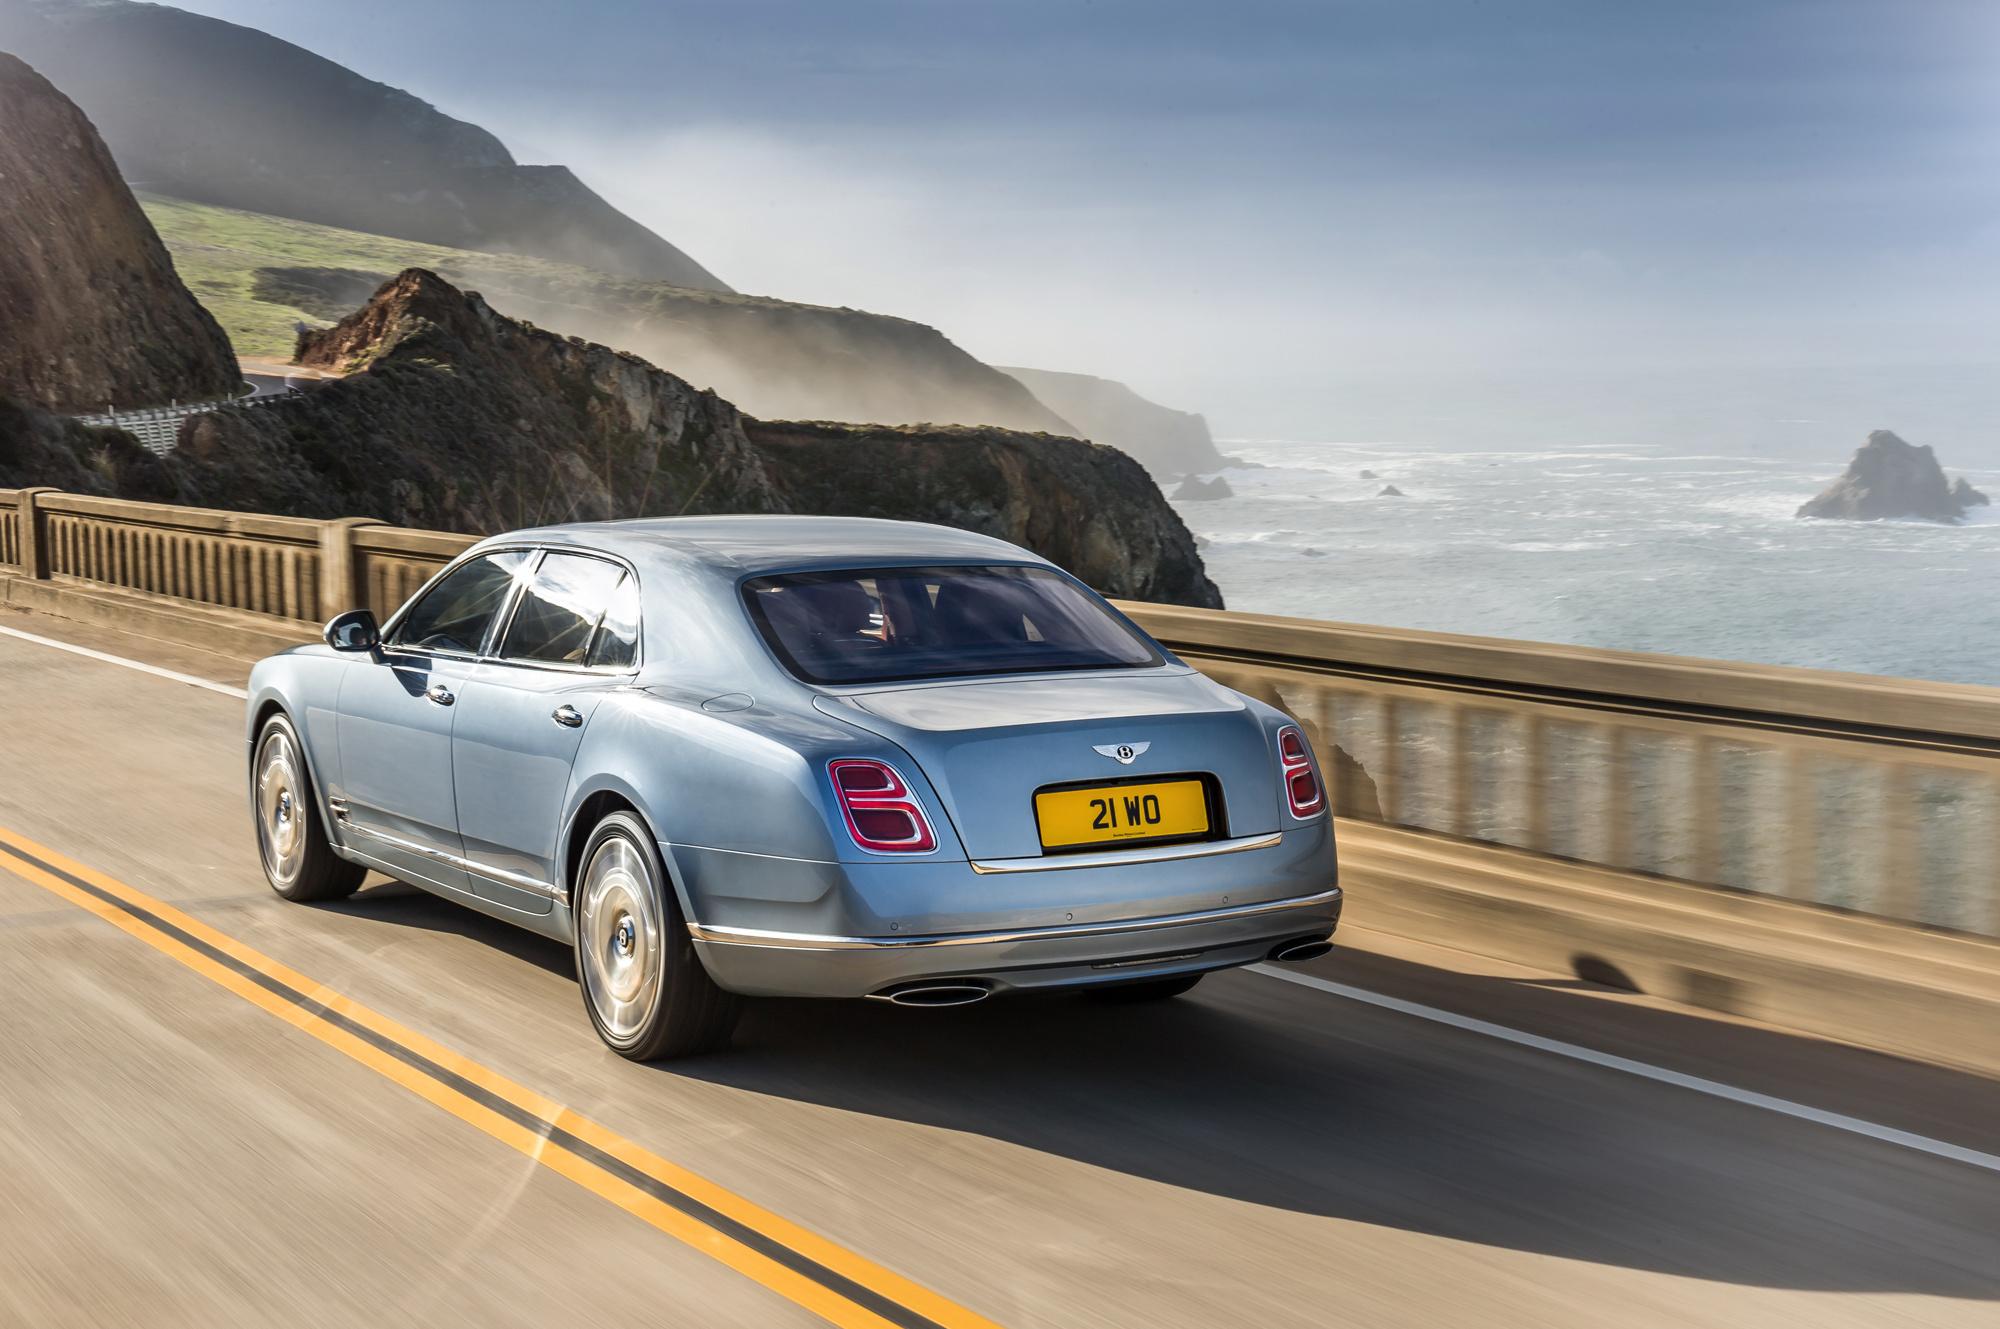 Pictures Of Bentley Mulsanne